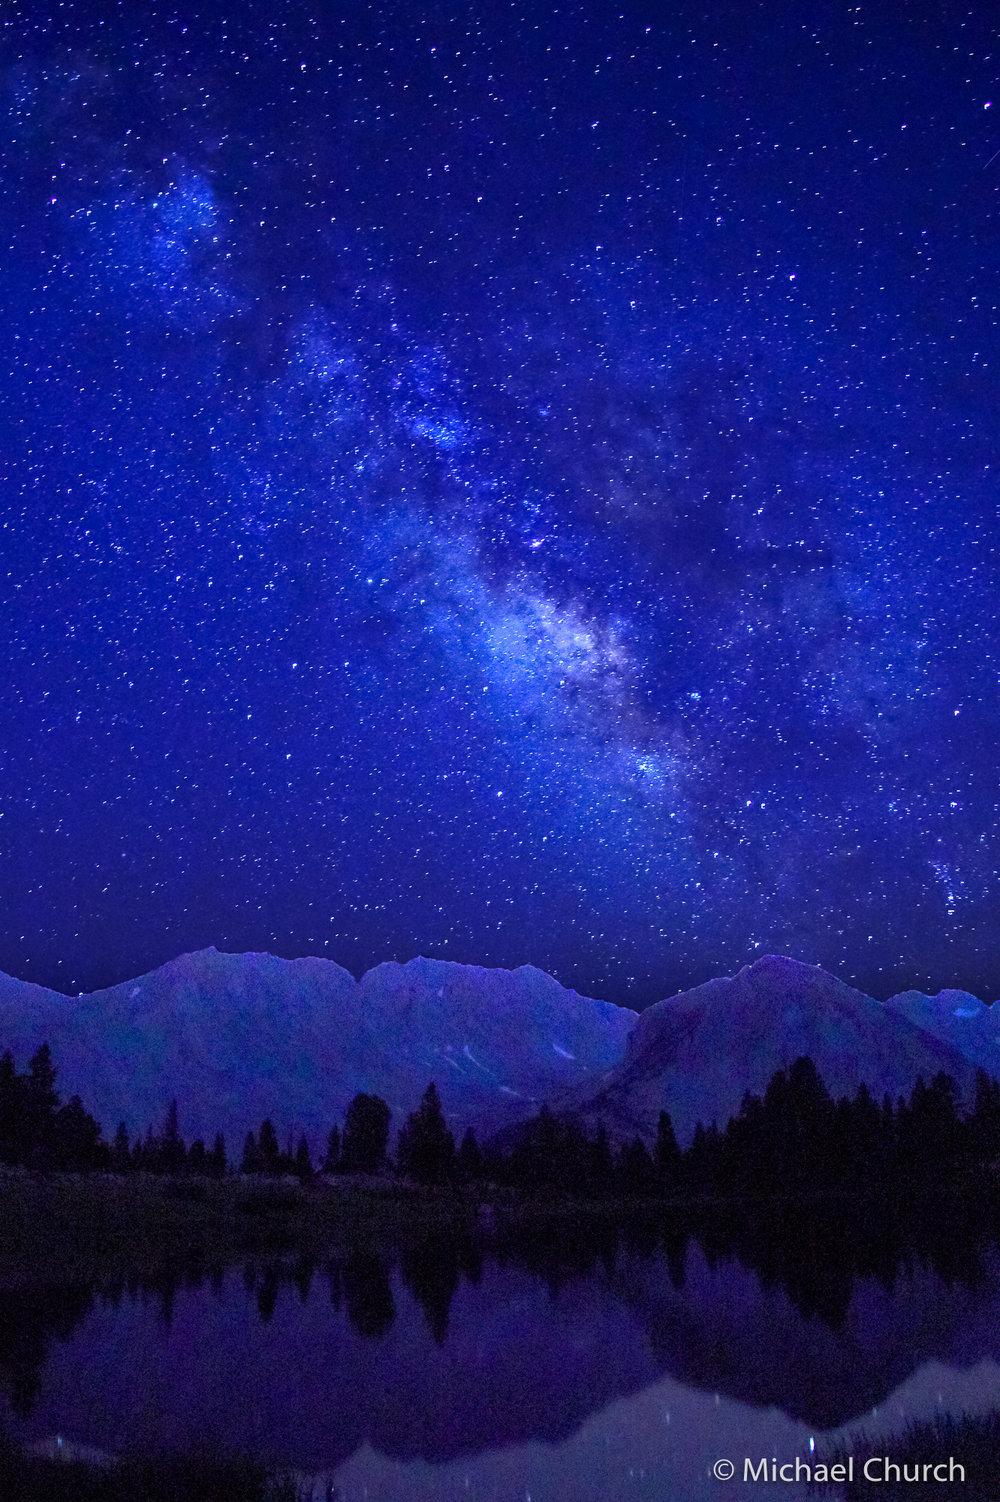 Milky Way_1182smaller_2K.jpg